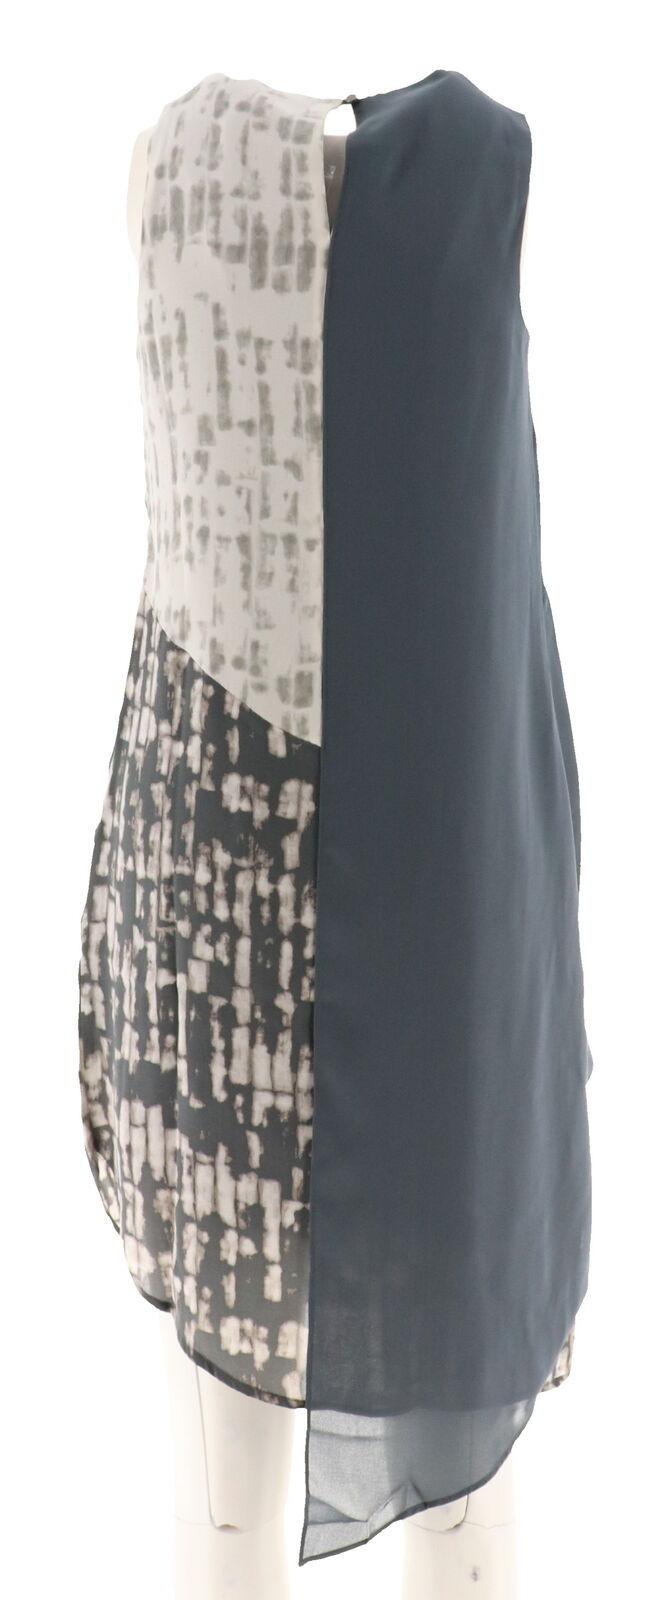 Halston Appeal Panel Slvless Color-Block Asymmetric Dress Granite 6 NEW A274552